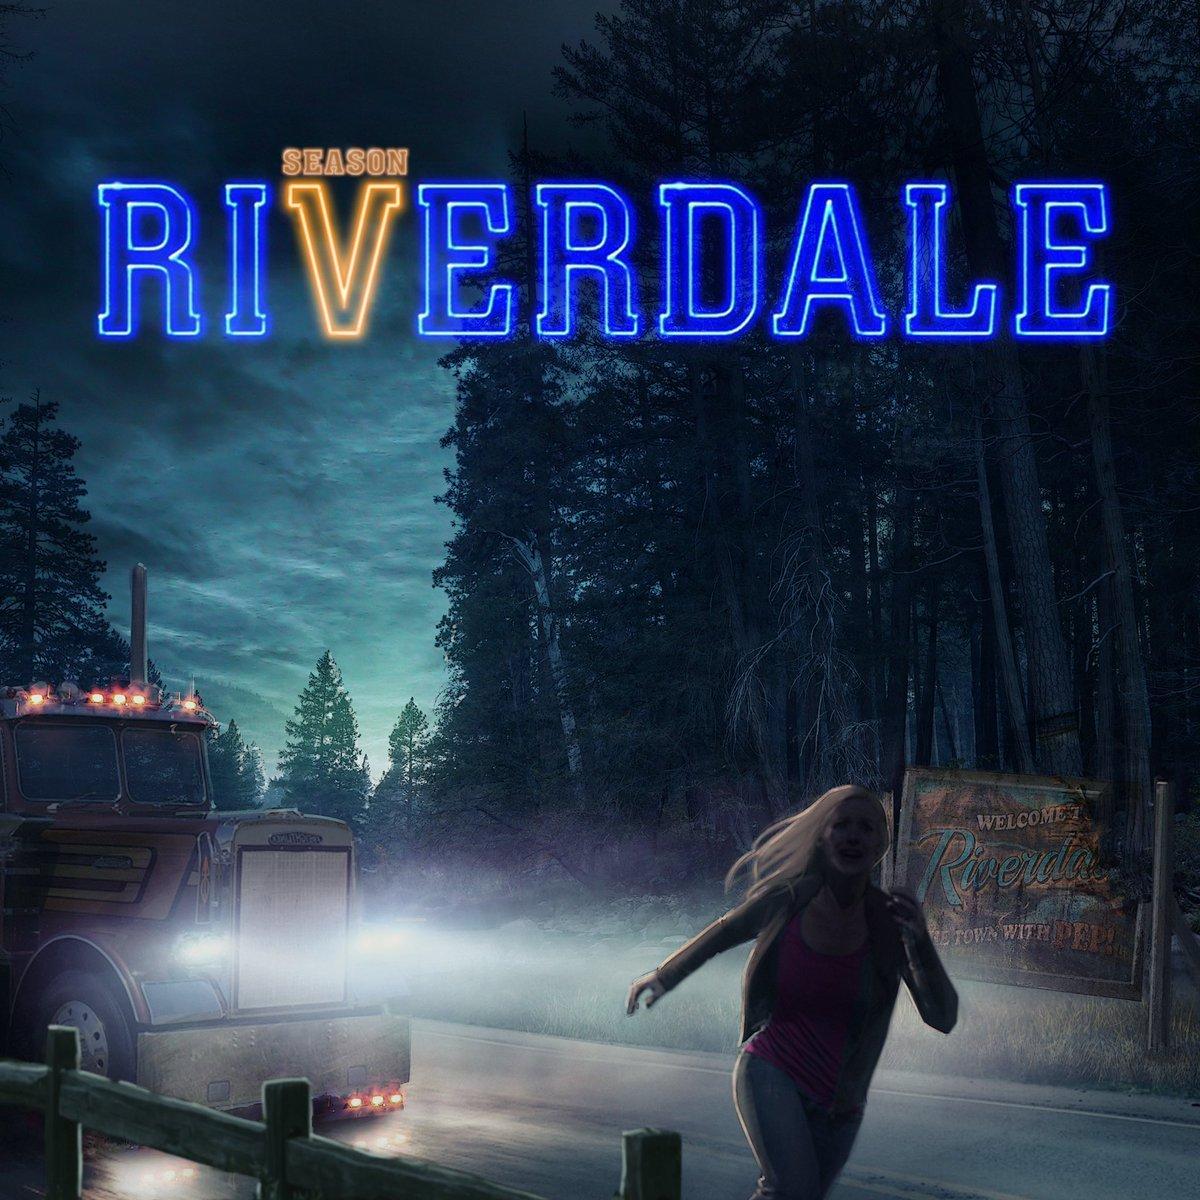 Riverdale Season 5 Official Poster